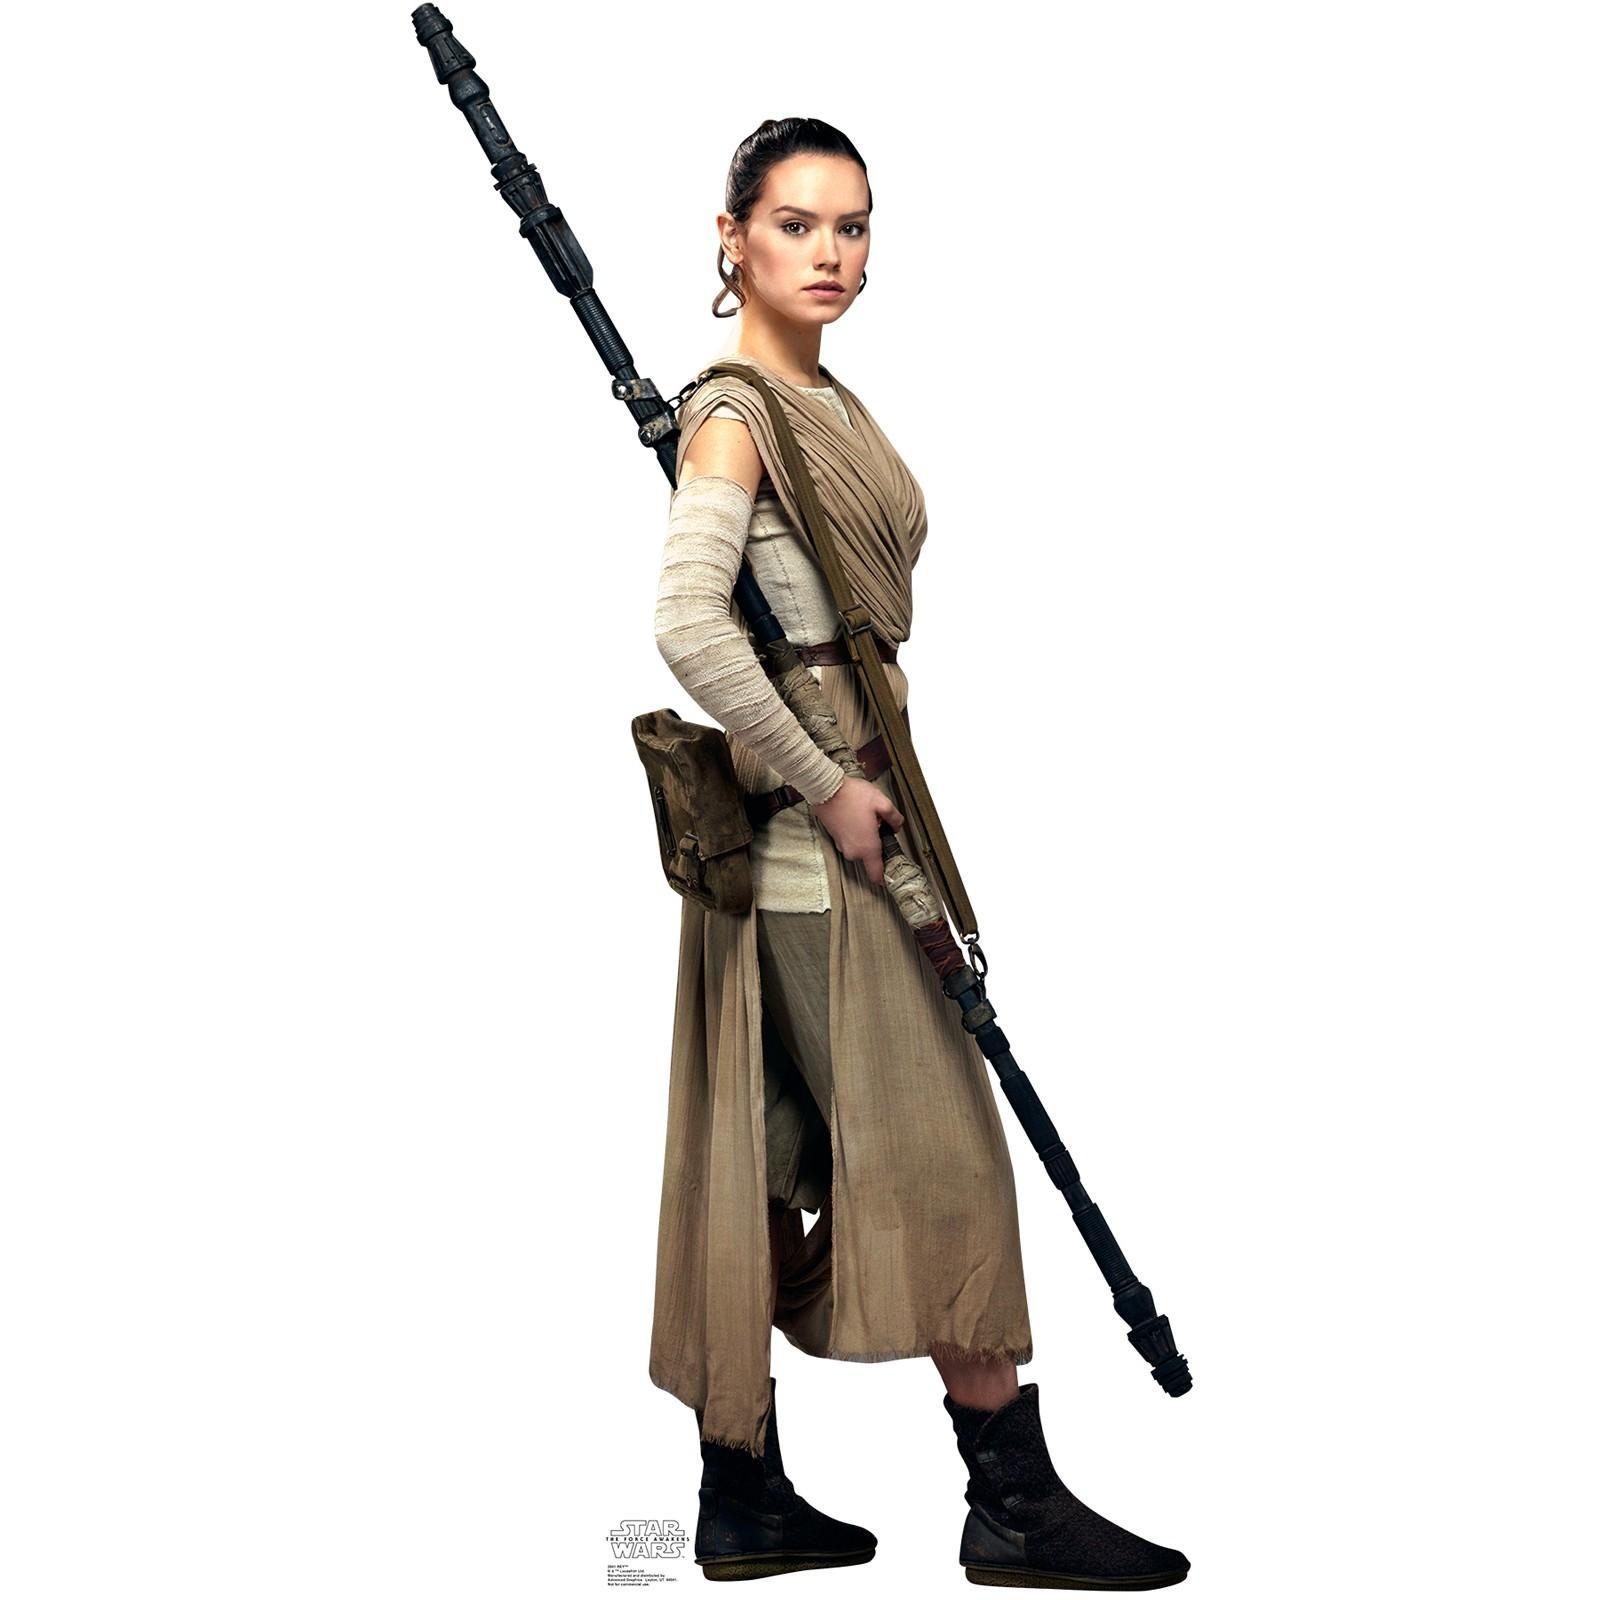 star-wars-7-the-force-awakens-rey-standup-6-tall-bc-101086.jpg (1600×1600)